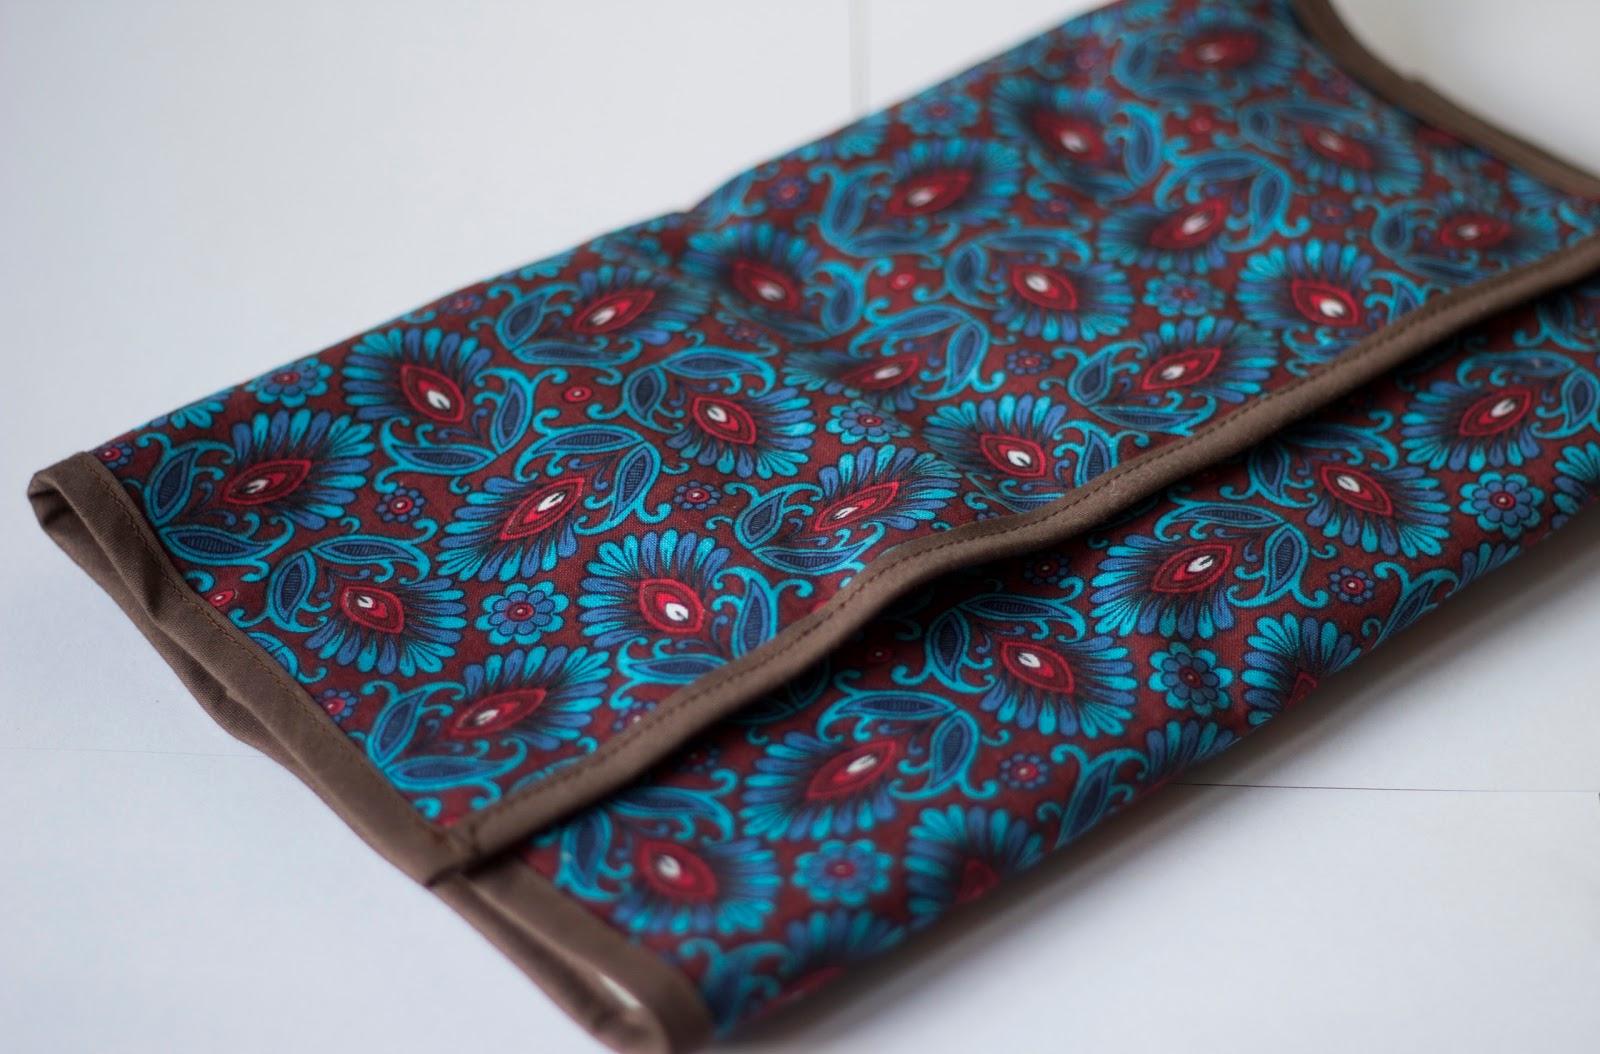 aufbewahrung stricknadeln diy selber nähen knit pro